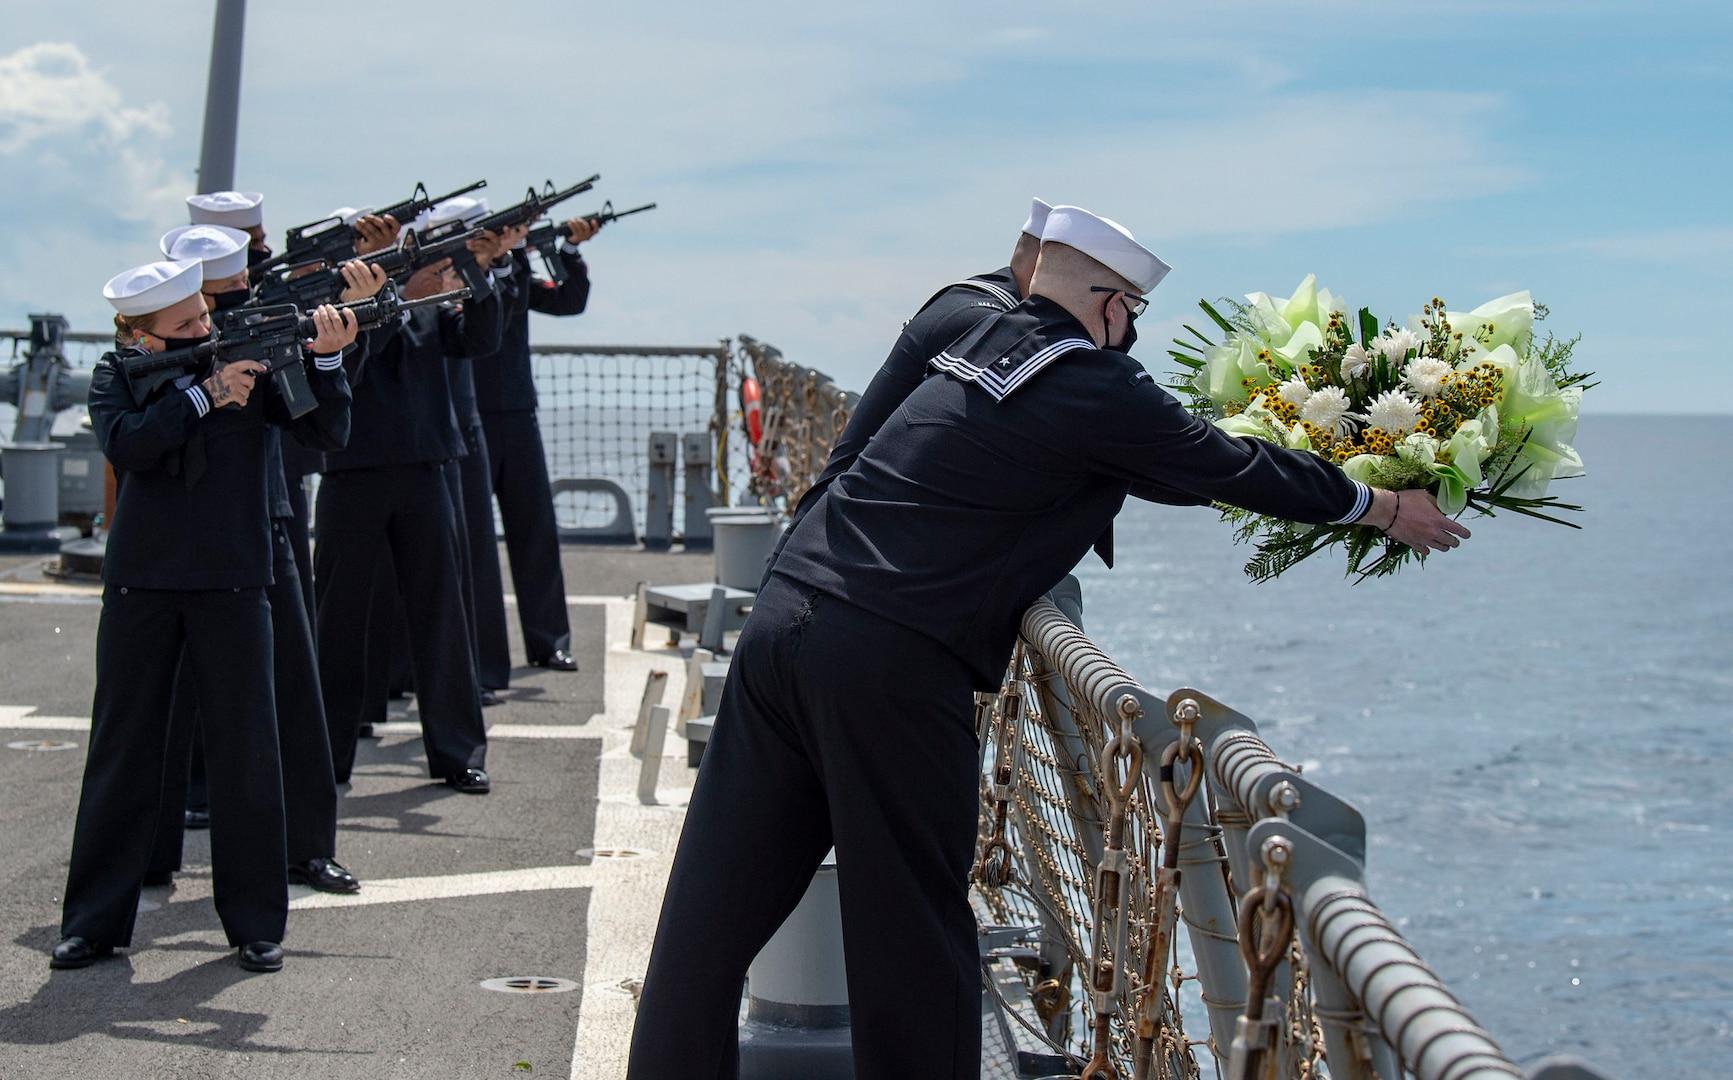 Battle of Leyte Gulf Commemoration